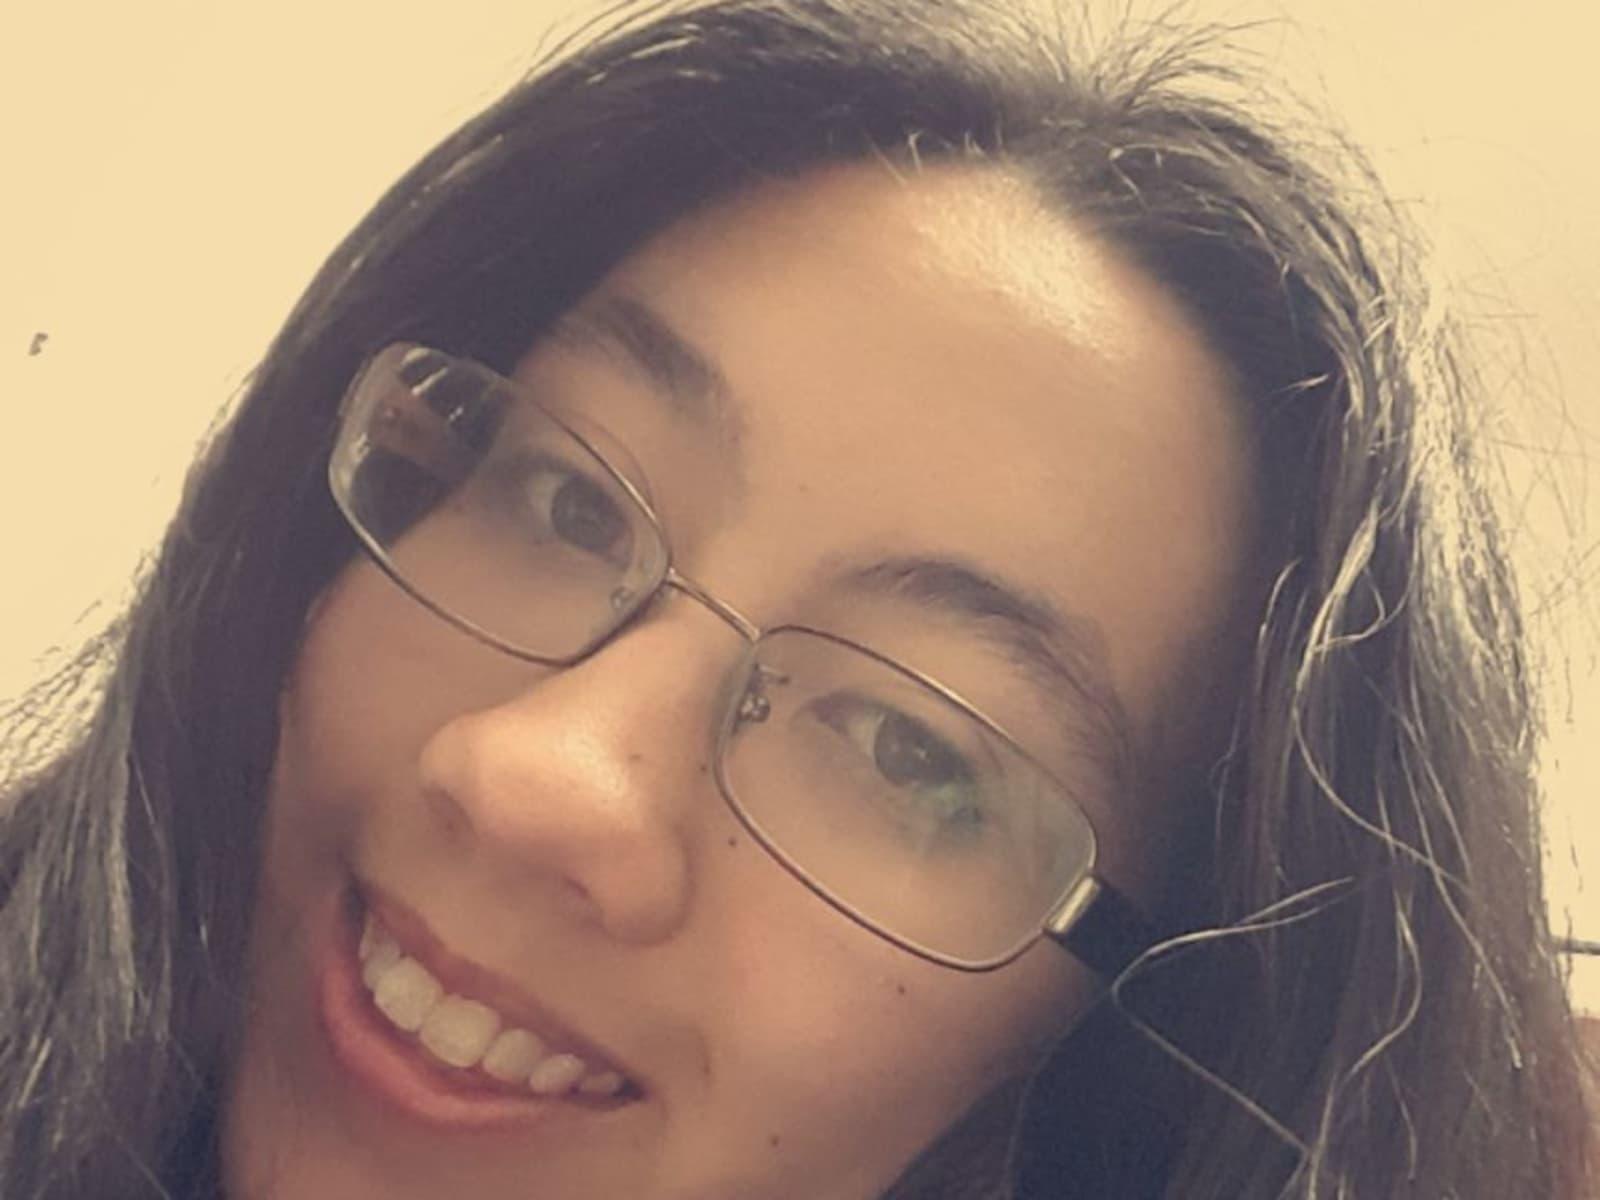 Sylvia from Toronto, Ontario, Canada